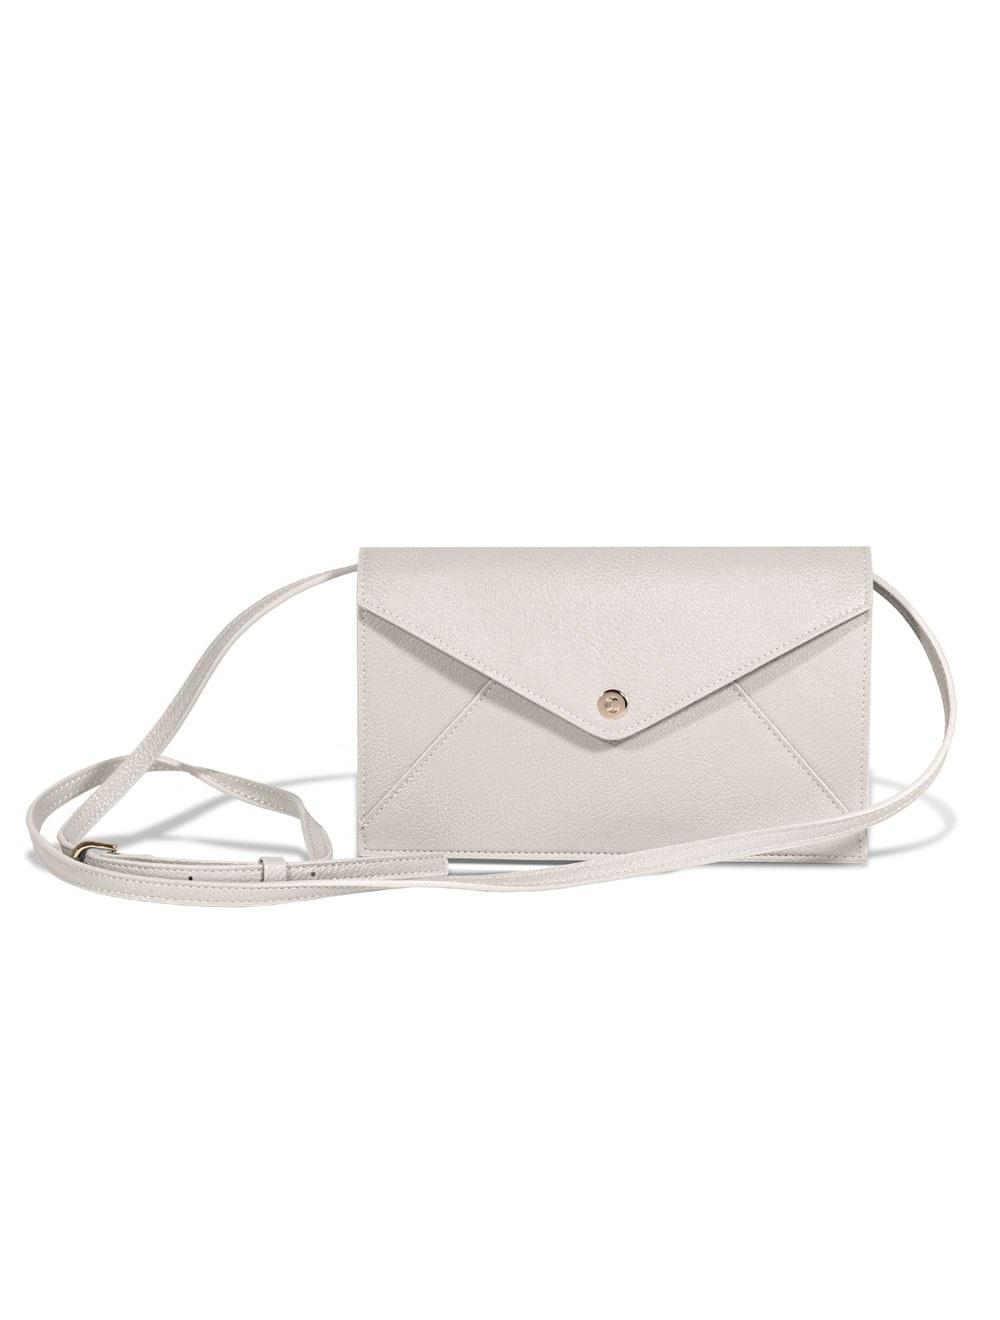 Wallet Bag Envelope Style - Off White